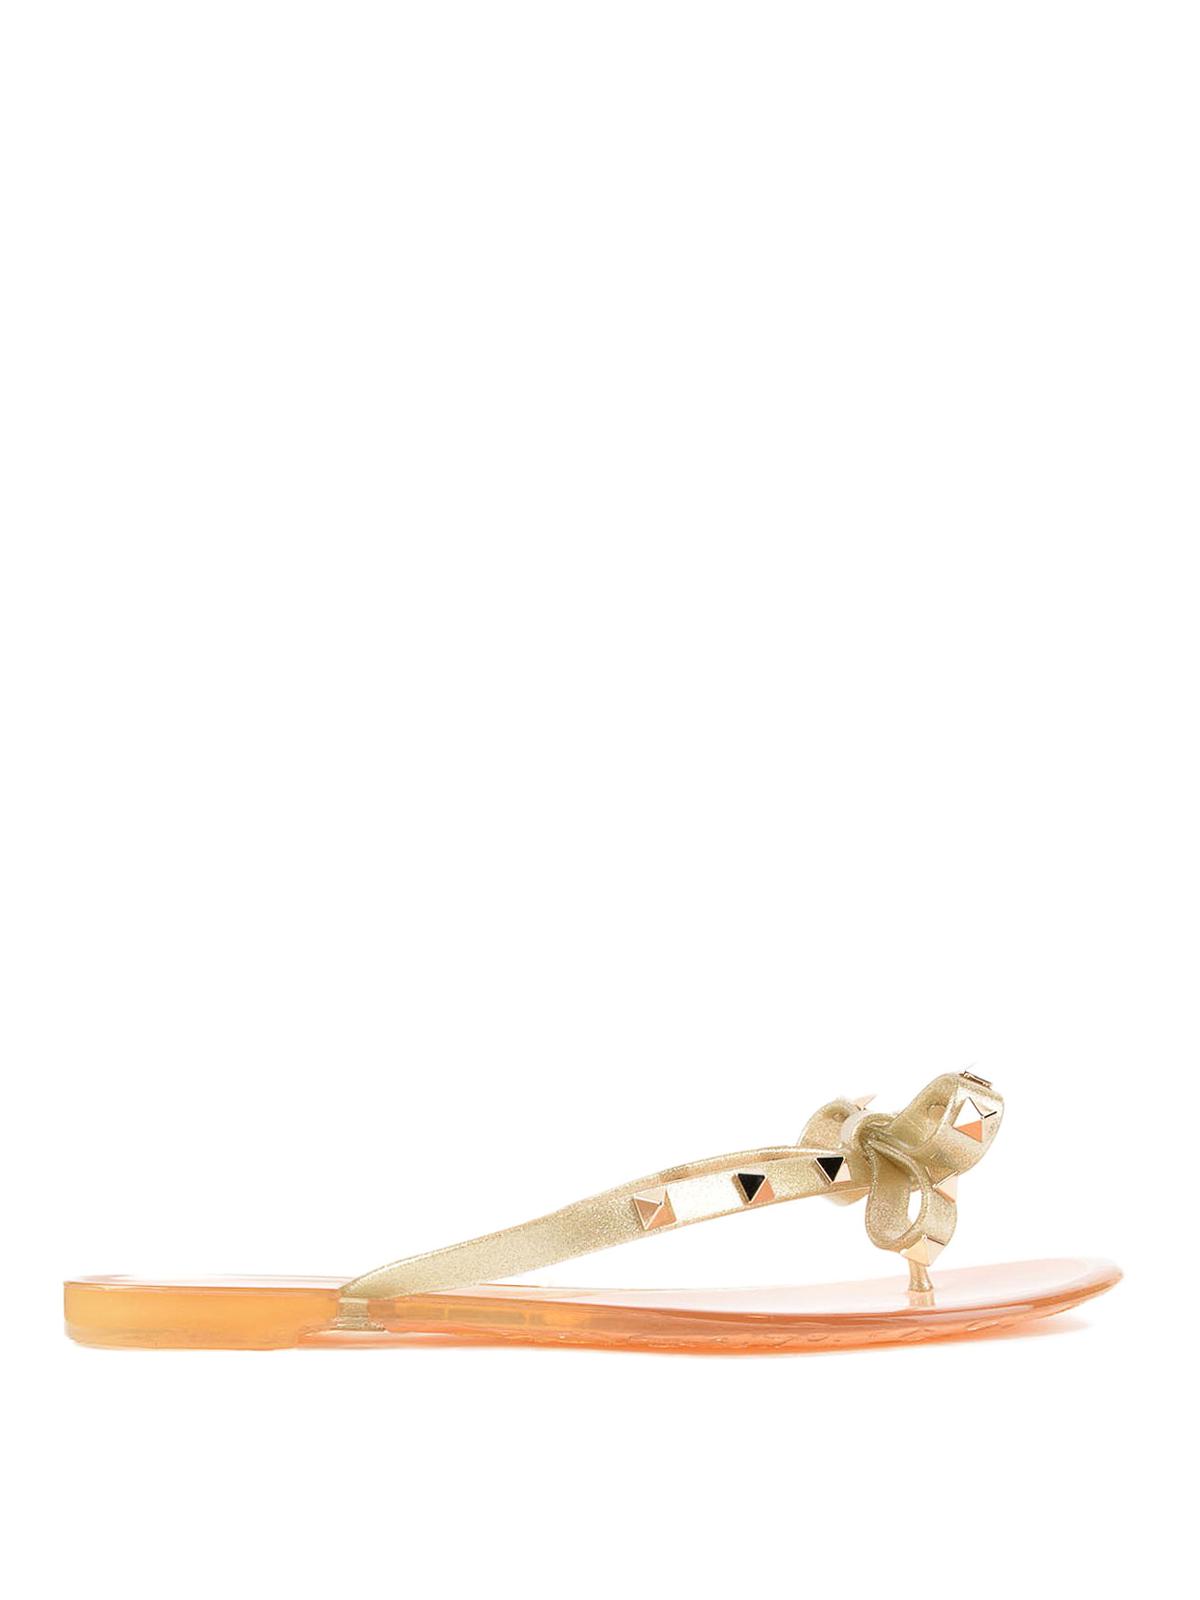 0479e0e02a06 Valentino Garavani - Rockstud PVC thong sandals - flip flops ...